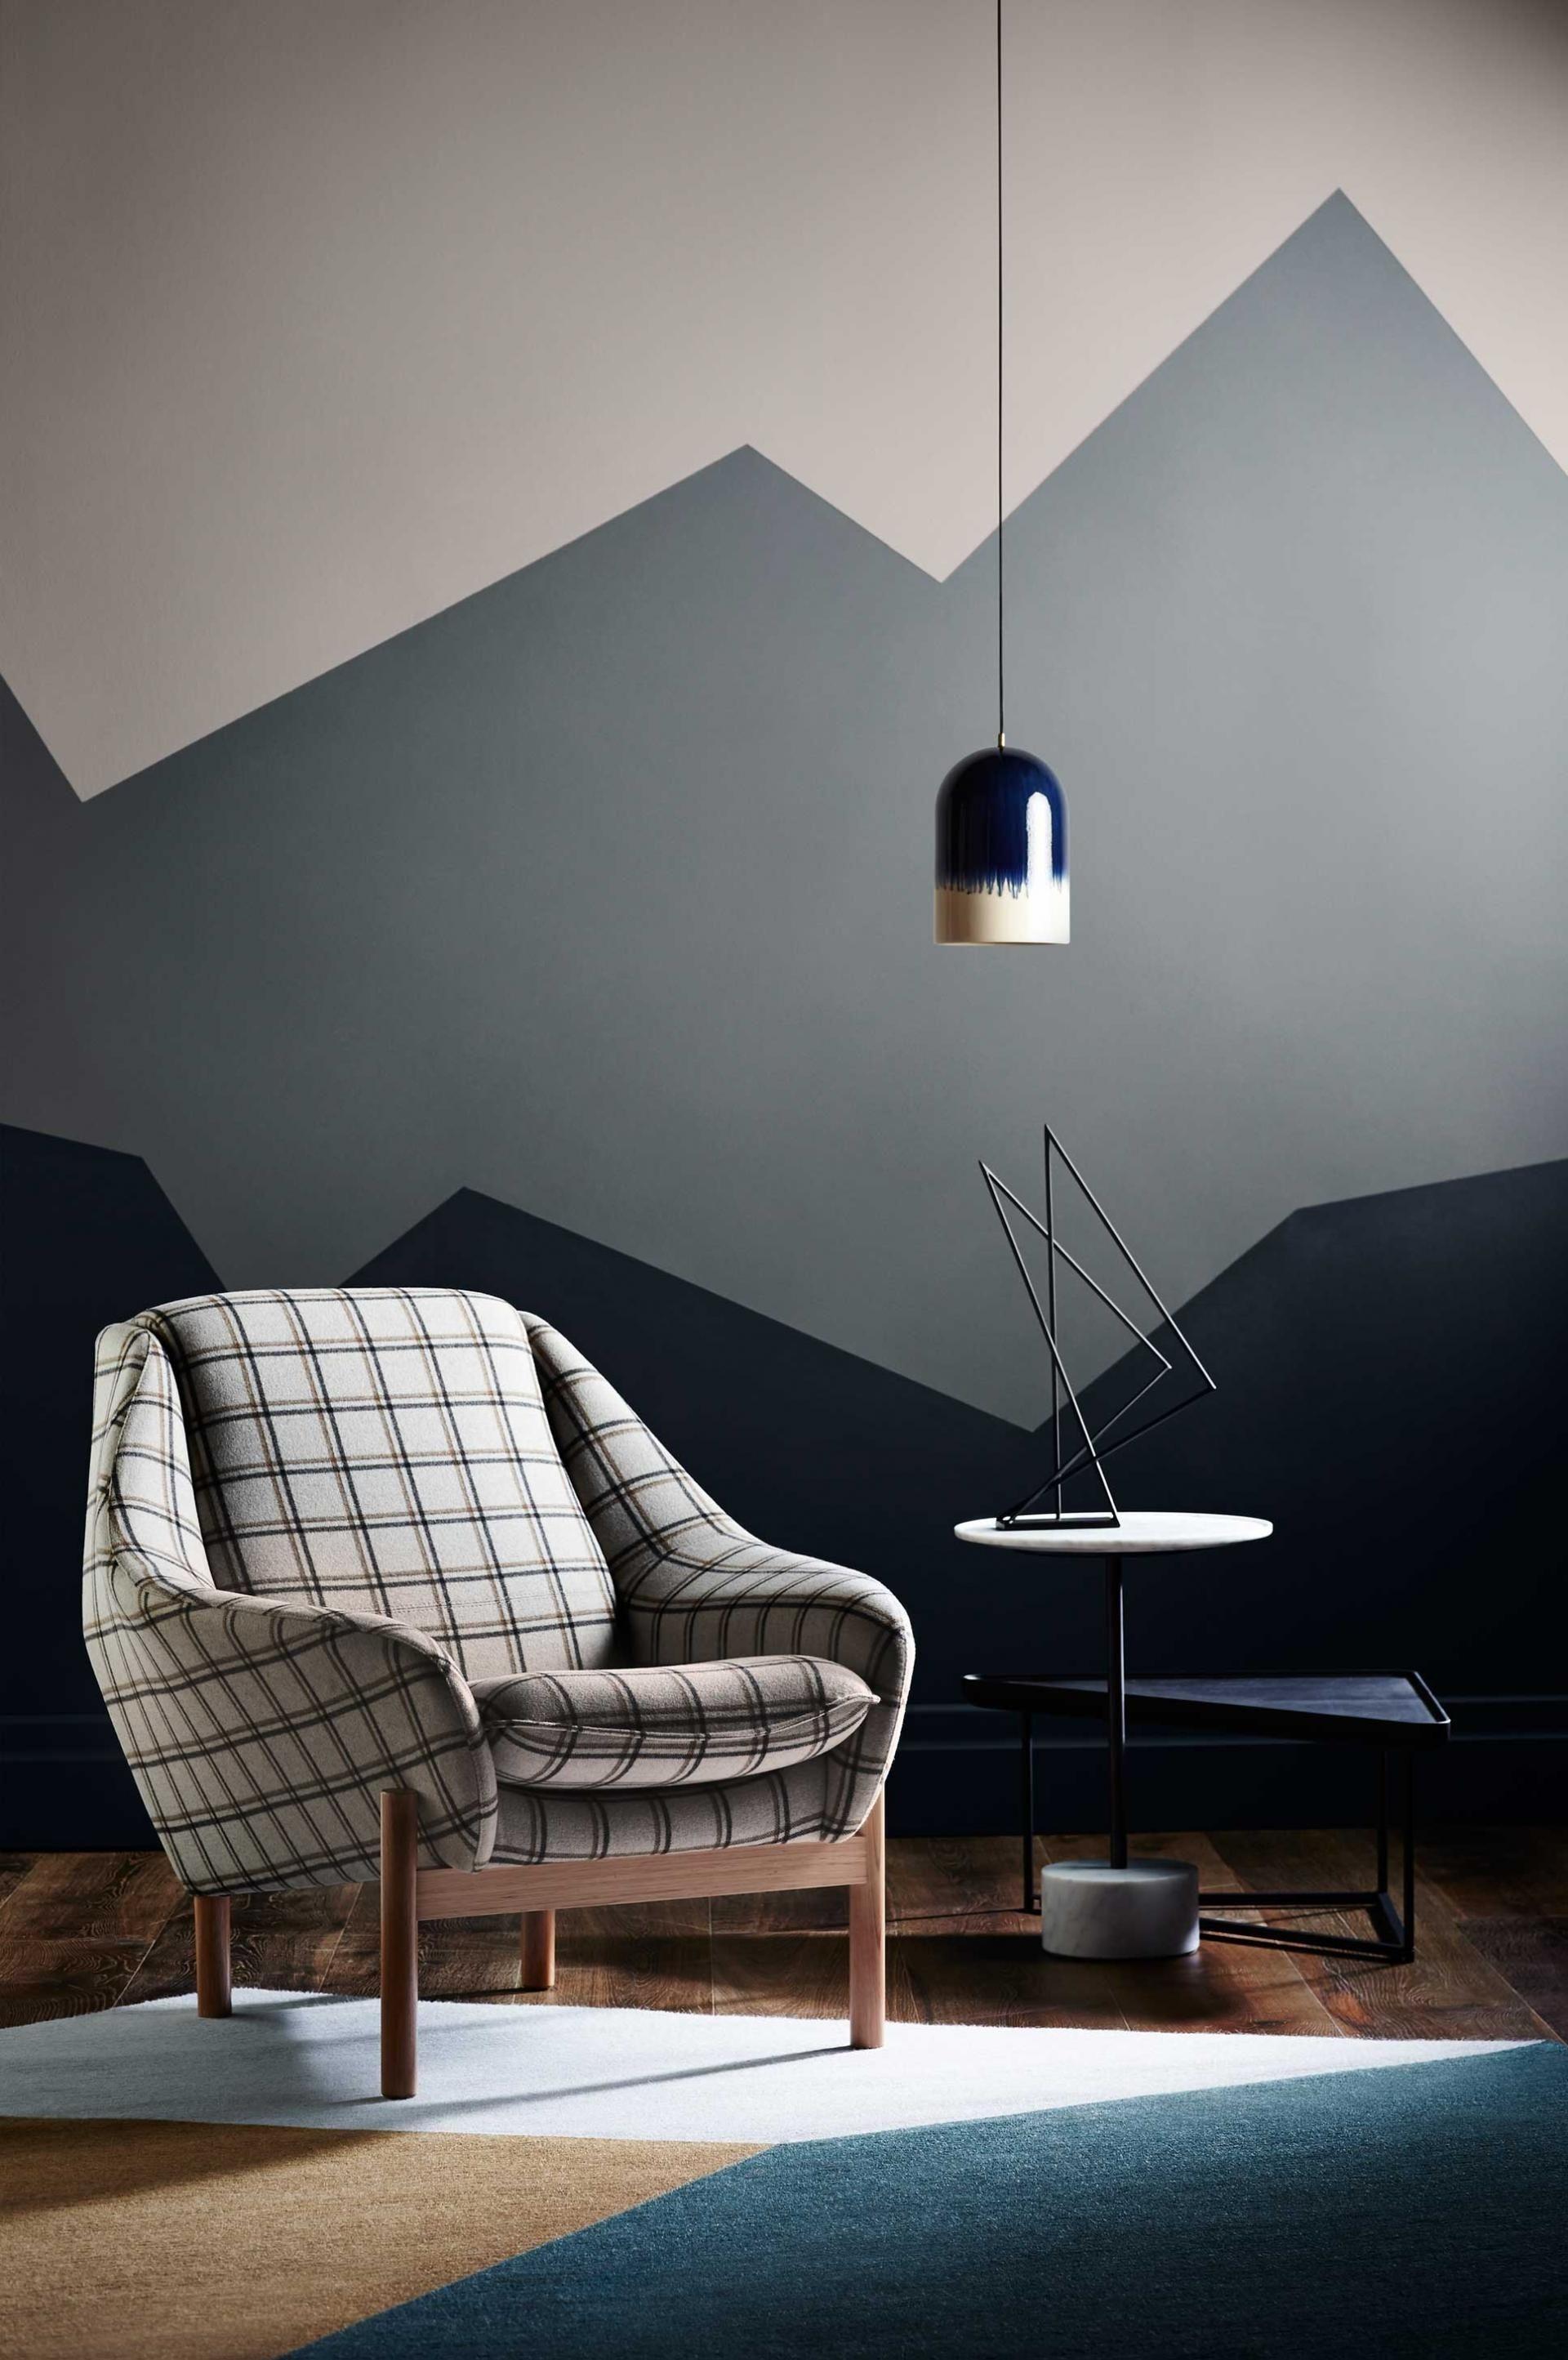 Lovely New Painting Walls Ideas Pinterest Cn05dp Https Canadagoosesvip Top Pinte Living Room Paint Diy Wall Interior Design